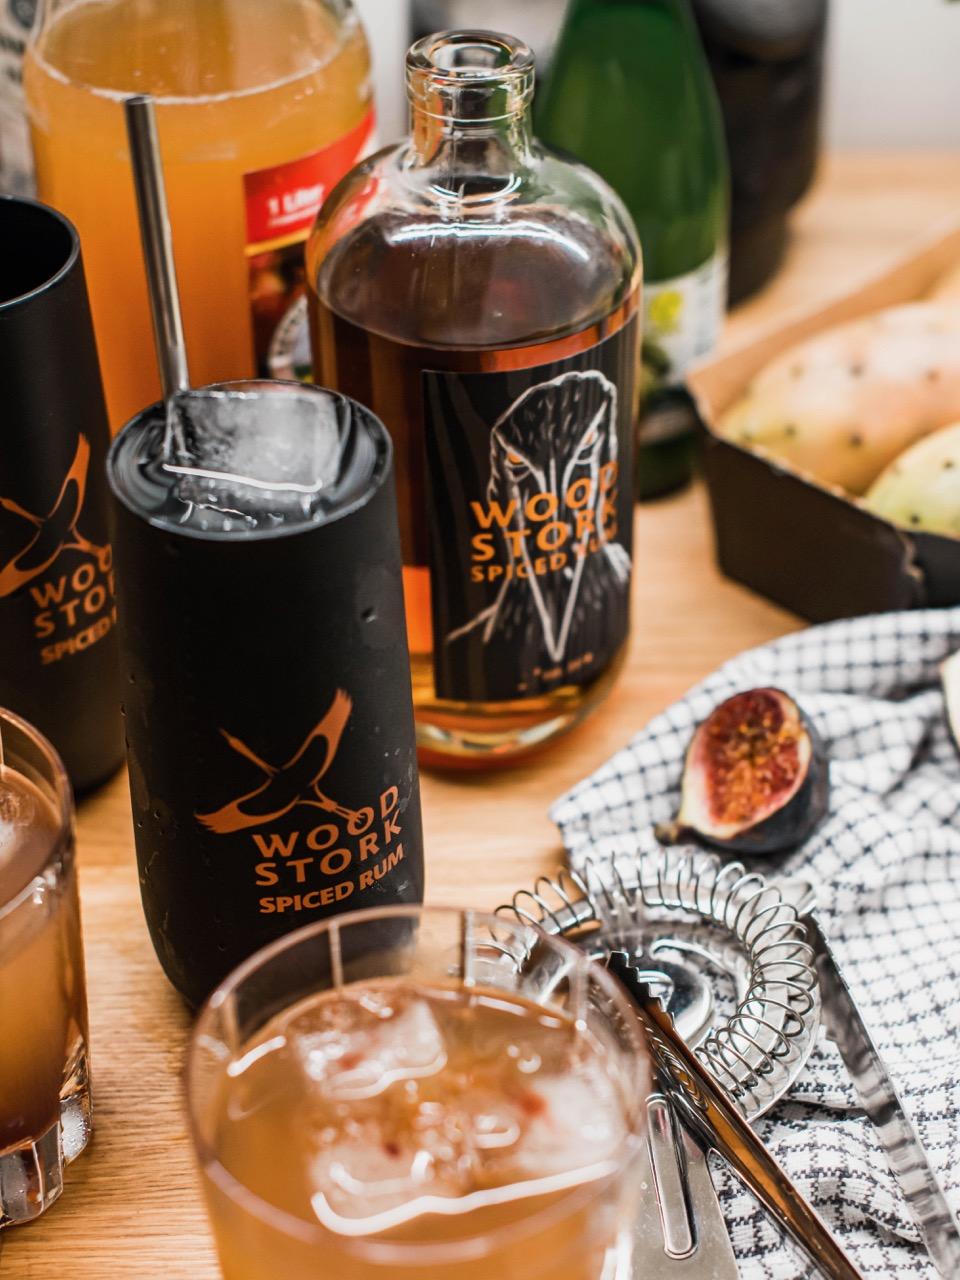 Wood Stork Spiced Rum